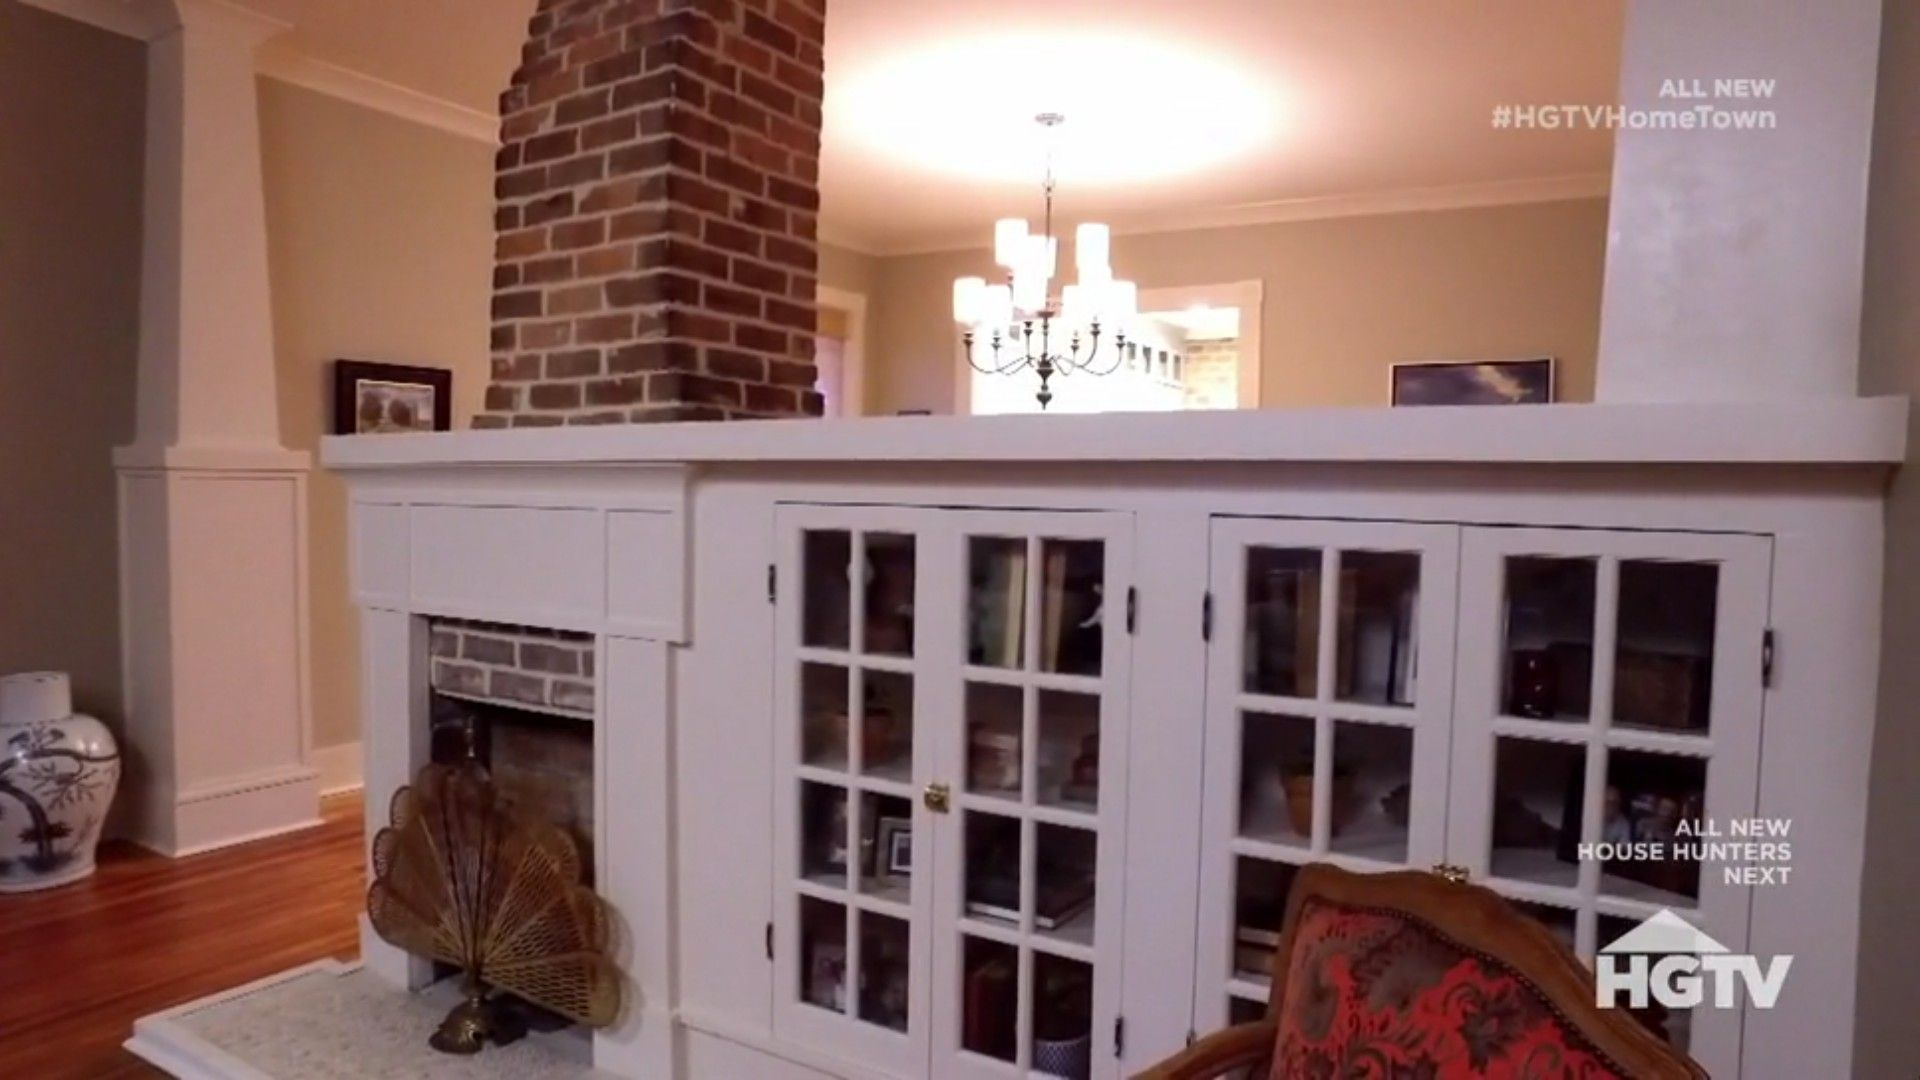 Hgtv Hometown Season 2 Episode 8 Updated Original Fireplace Home Town Hgtv Hgtv Living Room New Homes